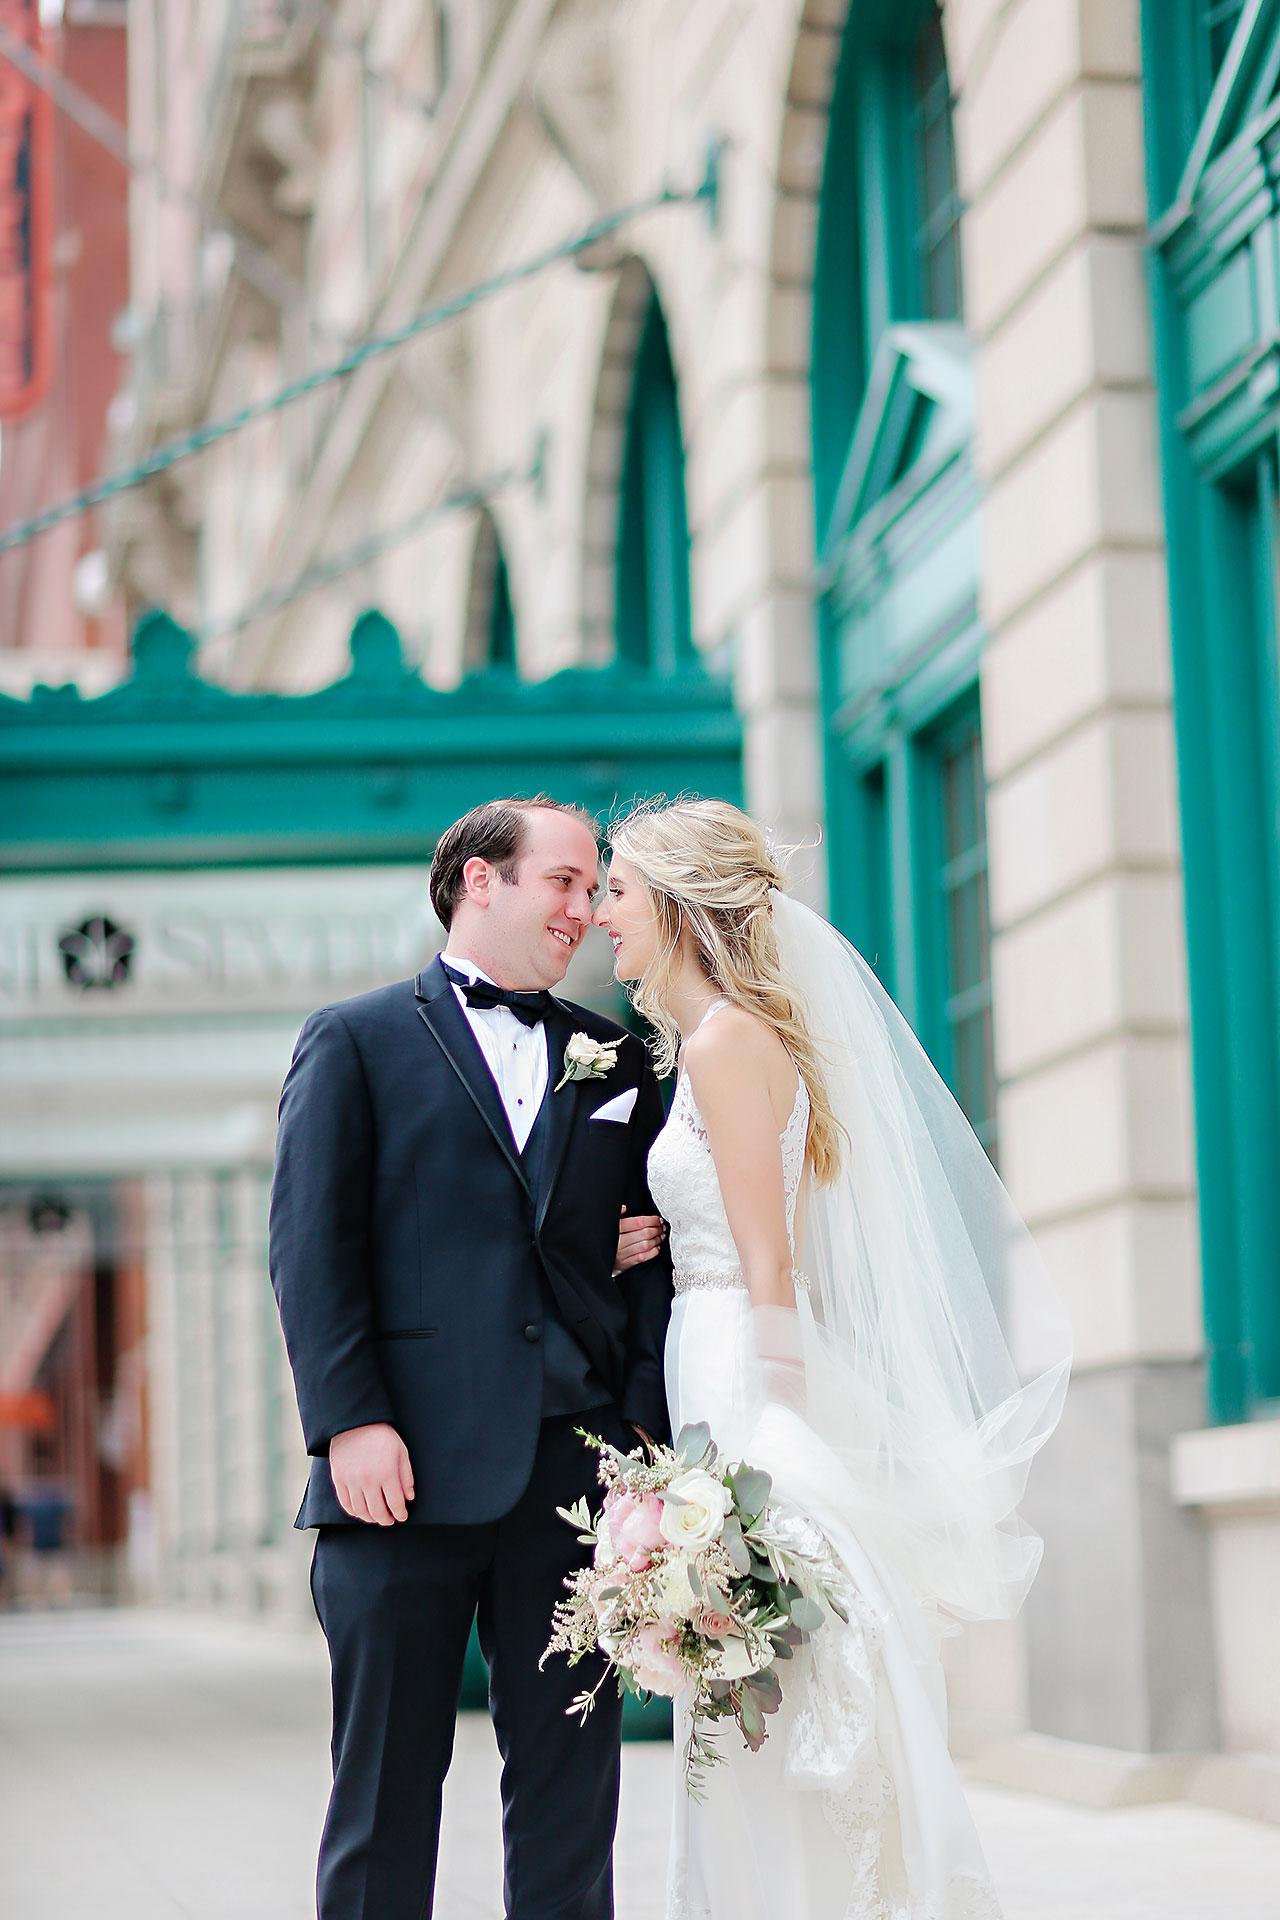 Allison Jeff Union Station Crowne Plaza Indianapolis wedding 078